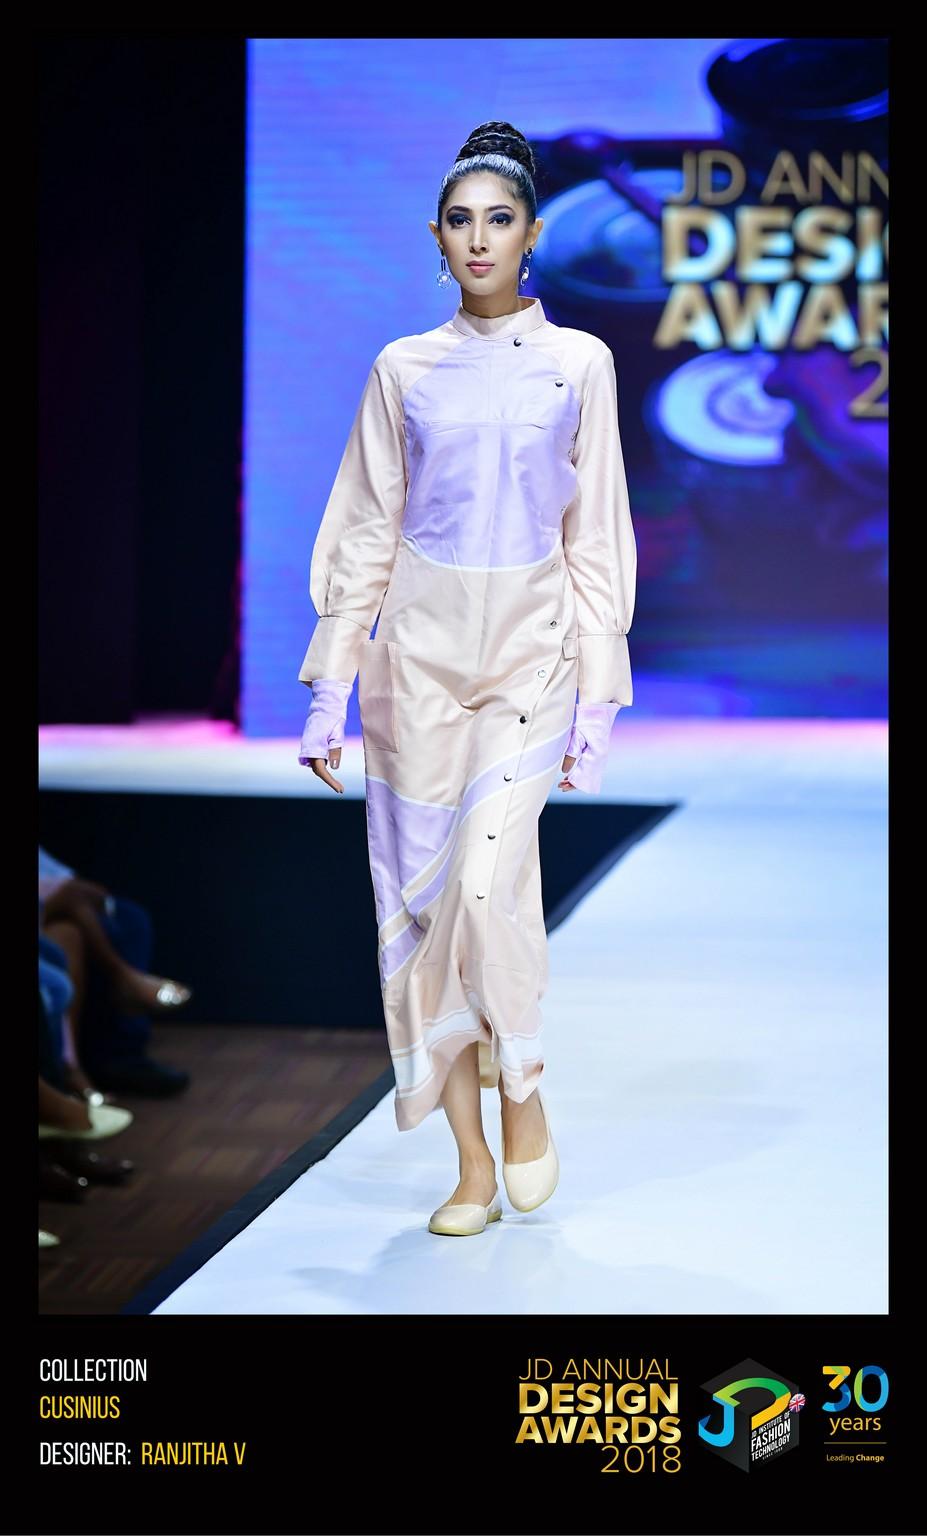 Cusinius – Change – JD Annual Design Awards 2018 | Designer: Ranjitha | Photography : Jerin Nath (@jerin_nath) cusinius Cusinius – Change – JD Annual Design Awards 2018 CUSINIUS 6